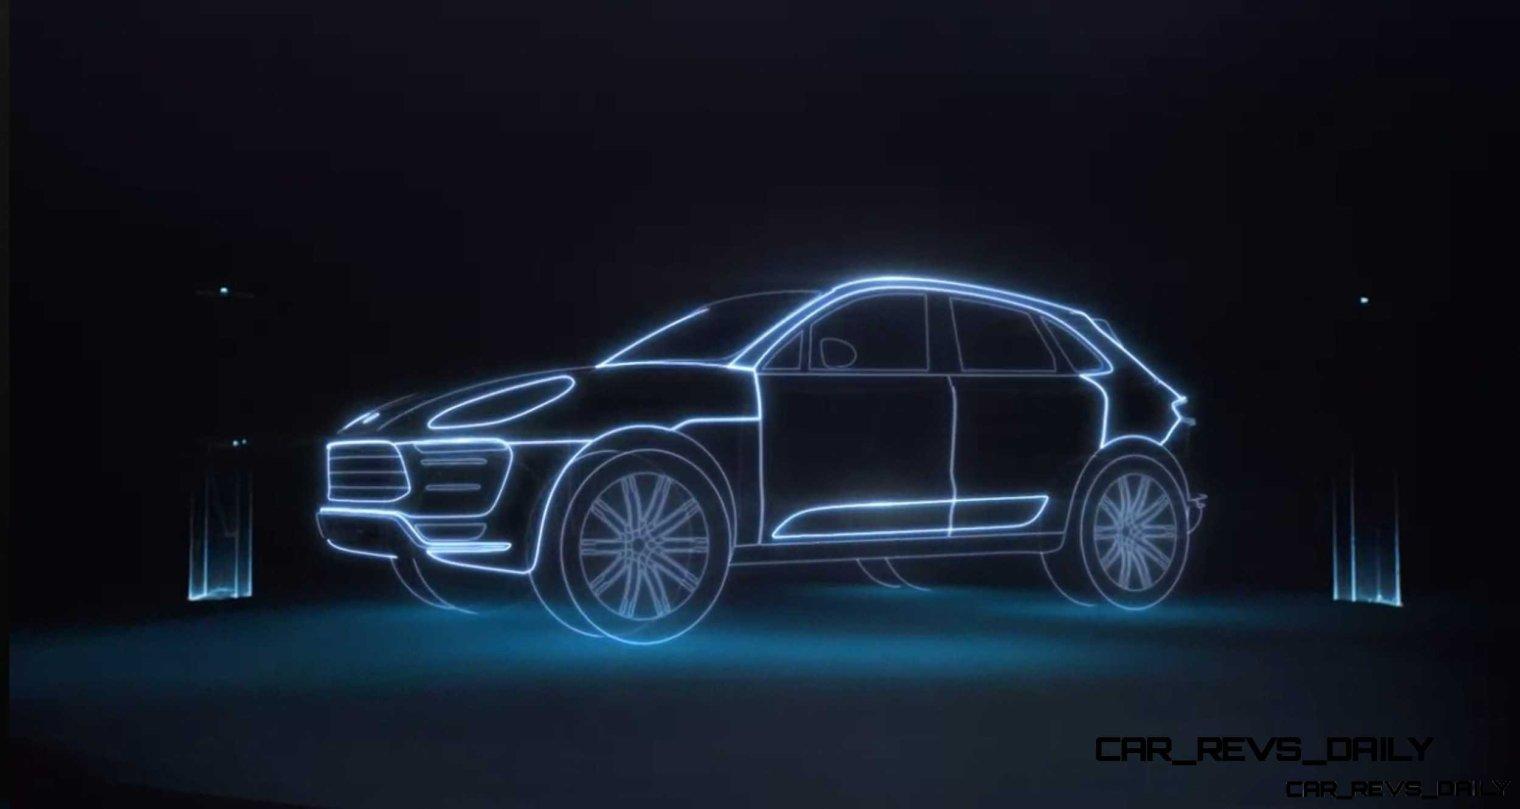 2015 Porsche Macan - Latest Images - CarRevsDaily.com 31